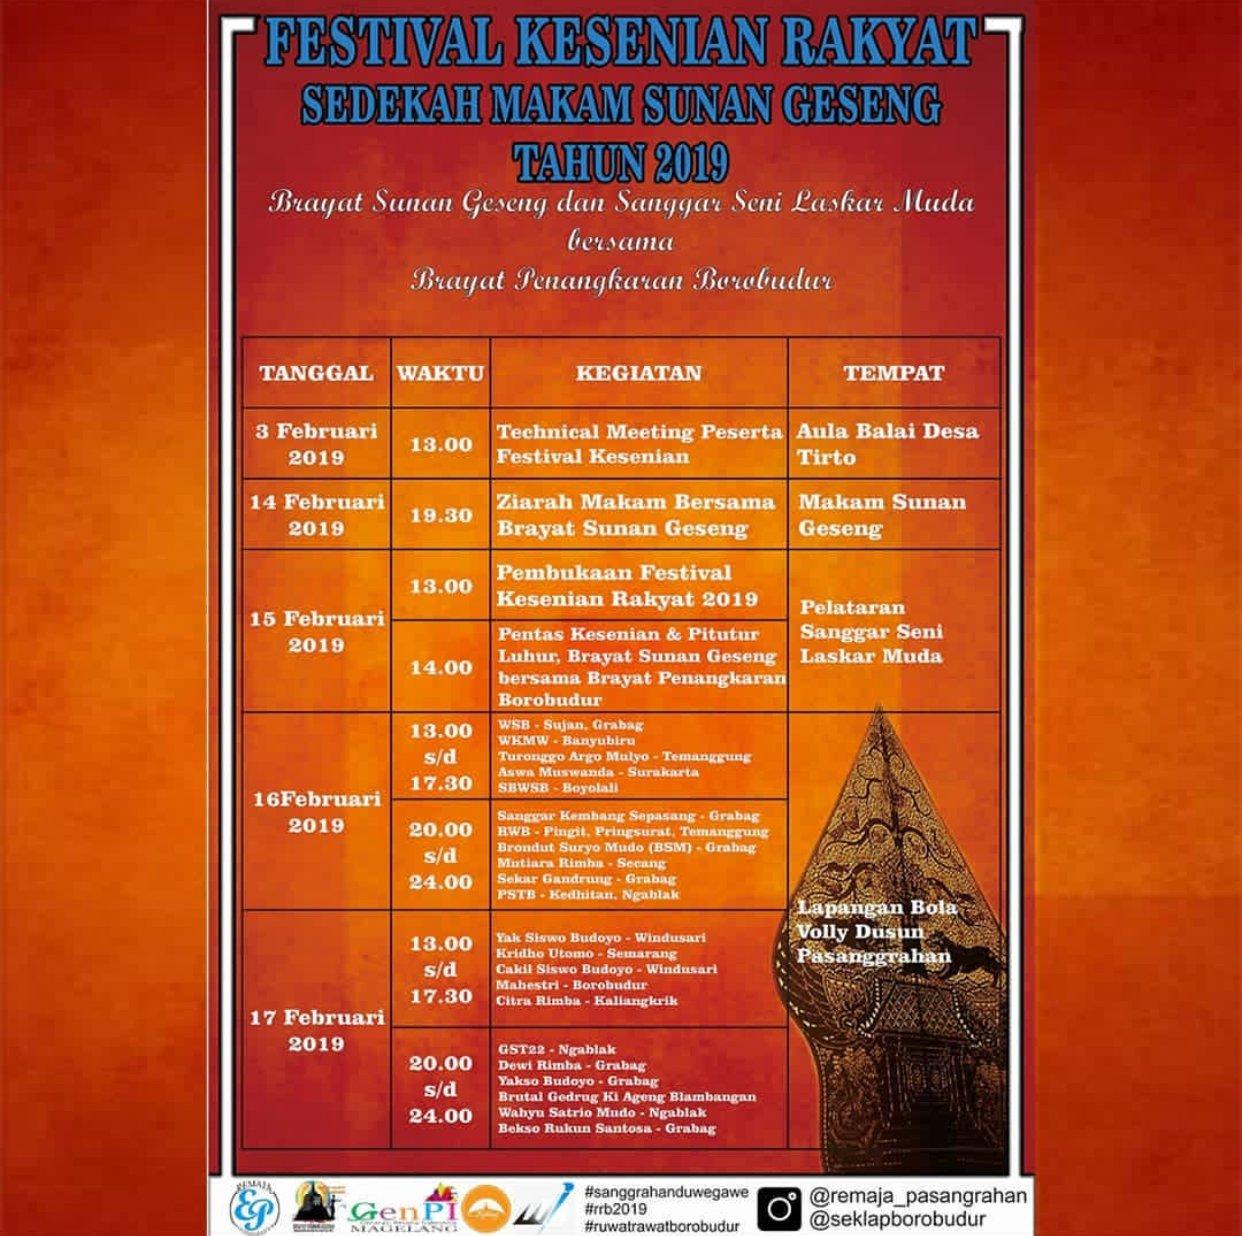 EVENT MAGELANG - FESTIVAL KESENIAN RAKYAT SEDEKAH MAKAM SUNAN GESENG 2019